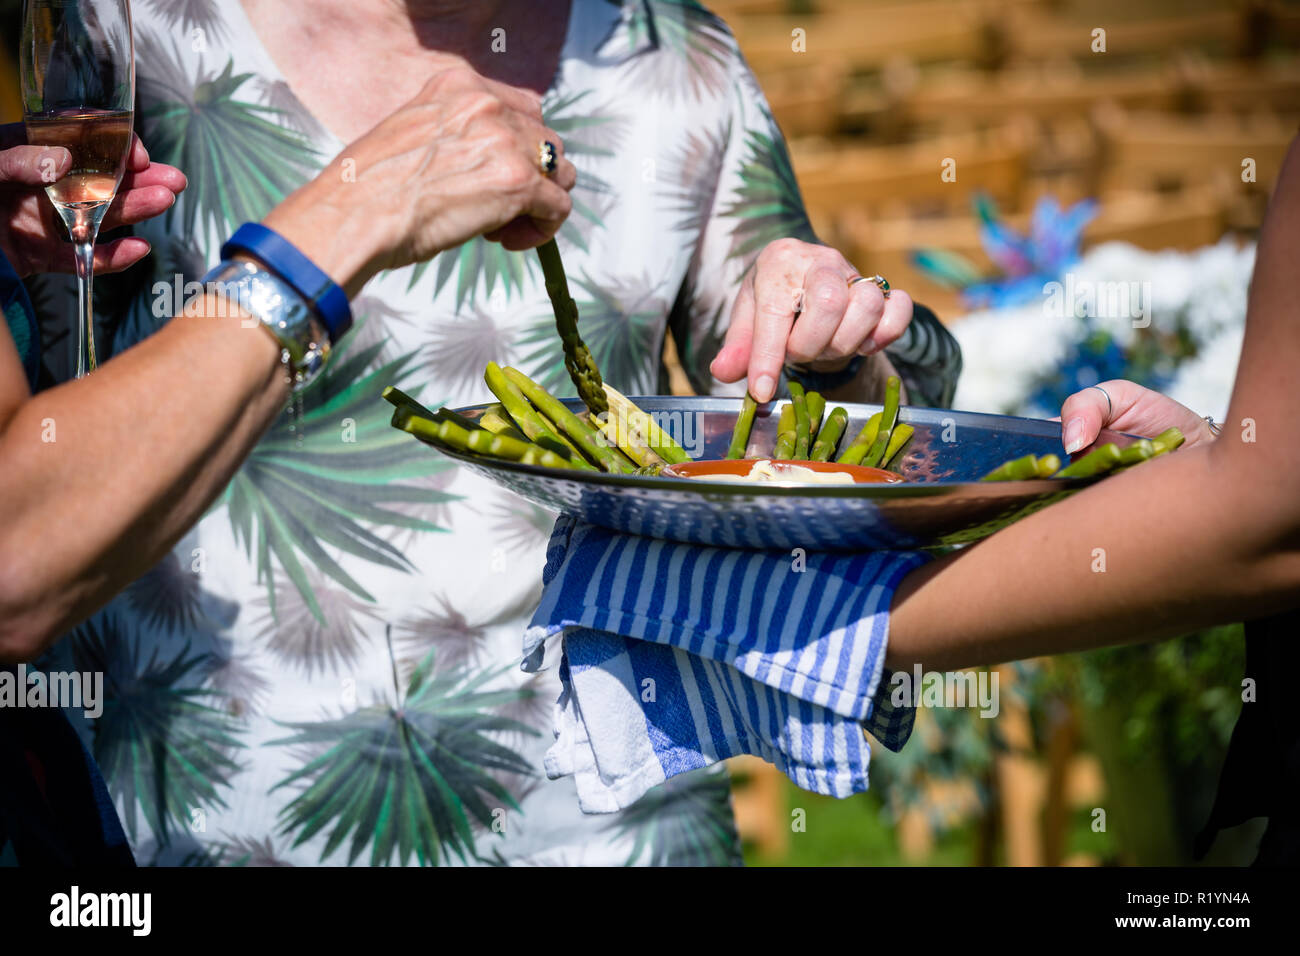 Garden Wedding celebration in England UK during the summer of 2018 Stock Photo